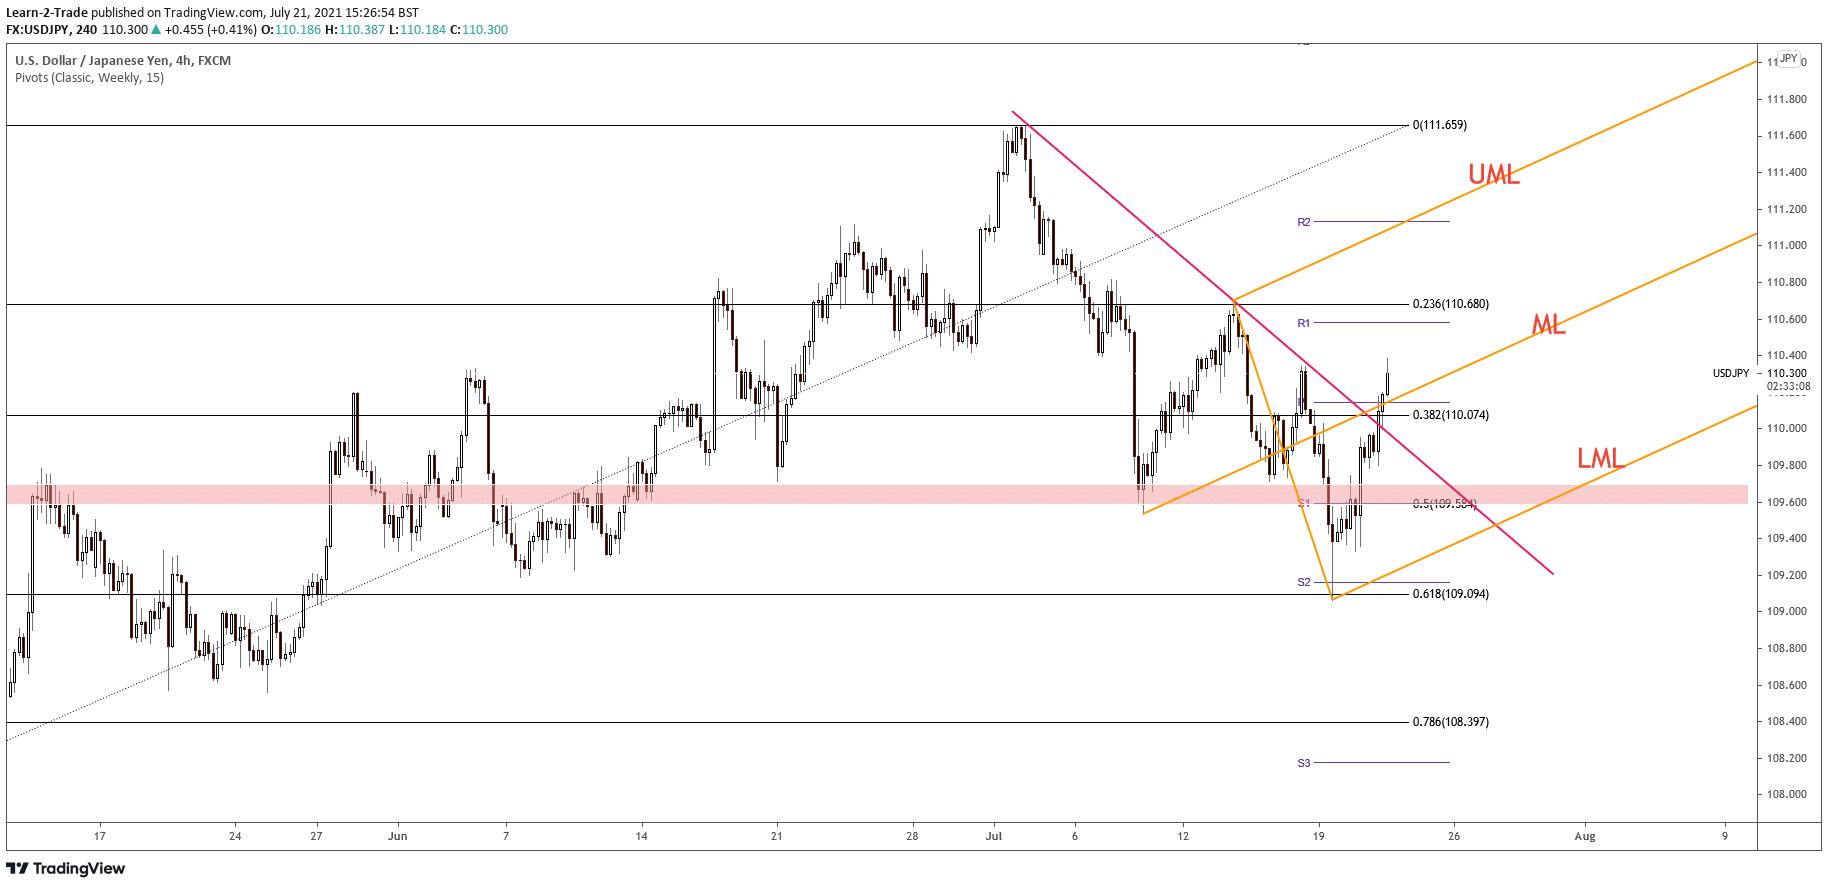 USD/JPY price analysis on 4-hour chart